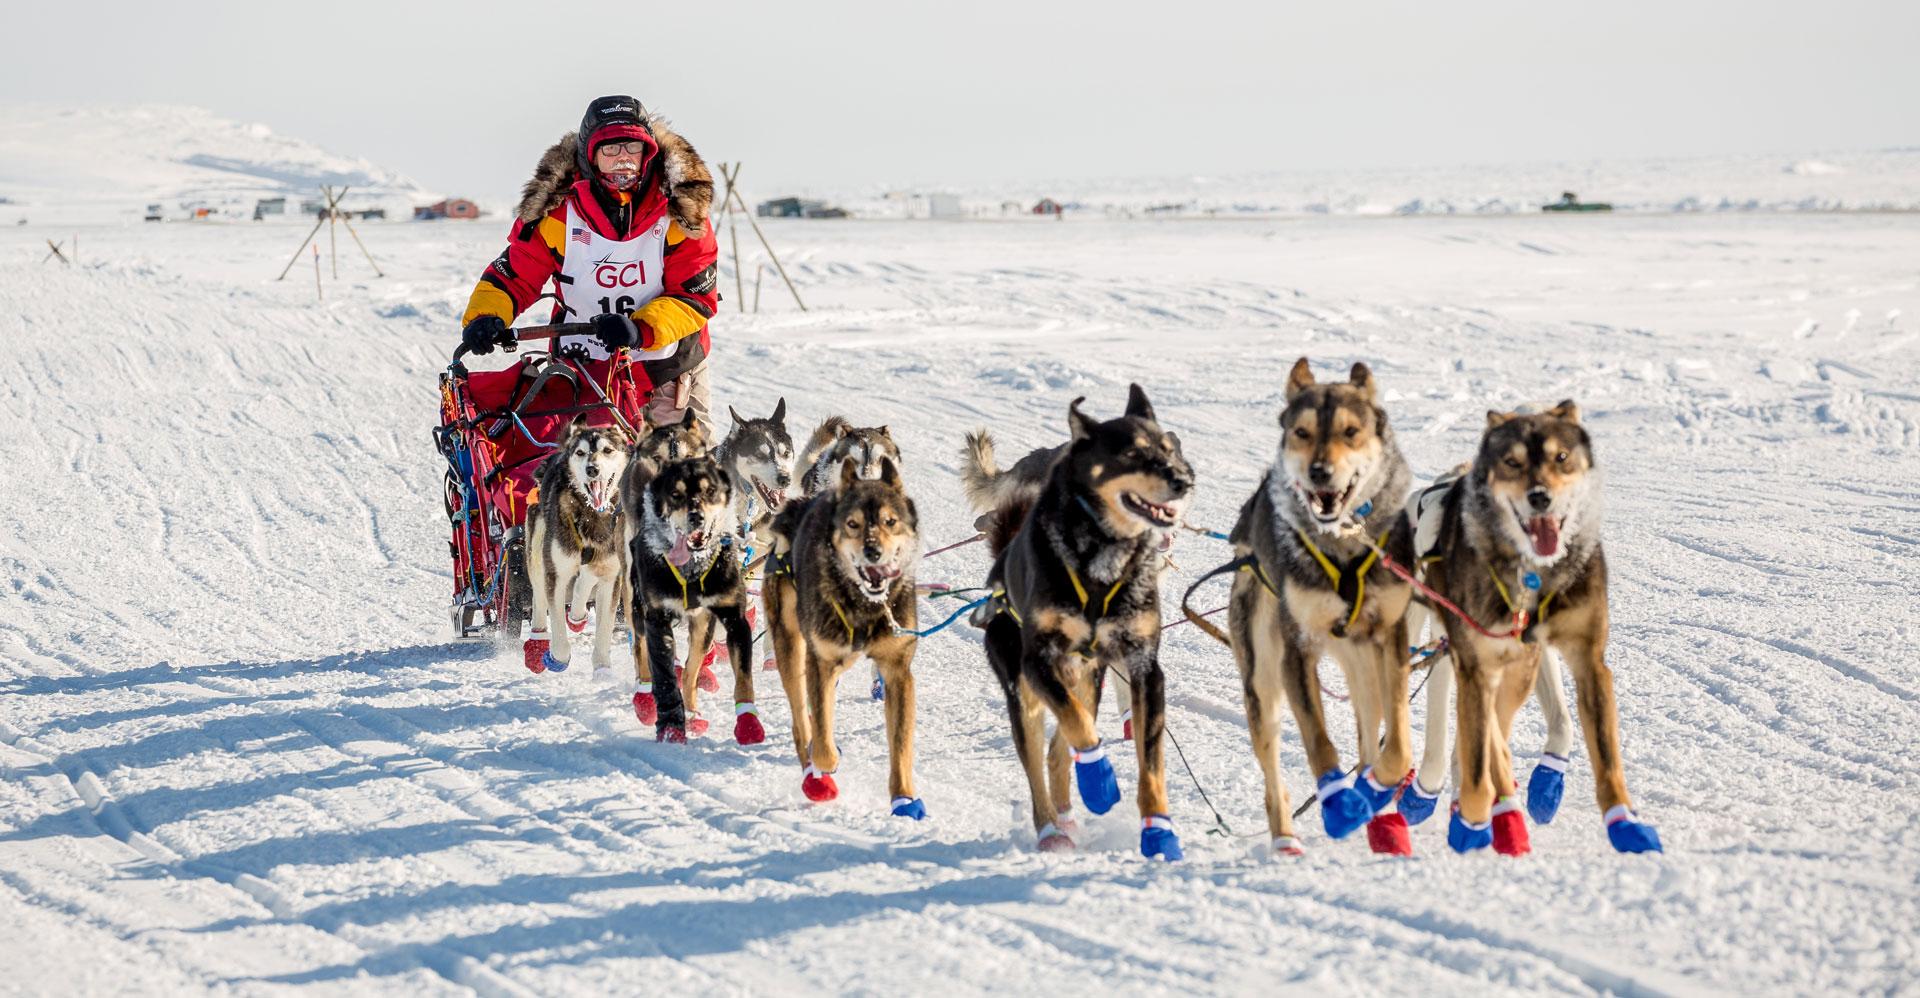 Seavey's IdidaRide Dog Sled Tour - Mitch Seavey Iditarod Champion 2017